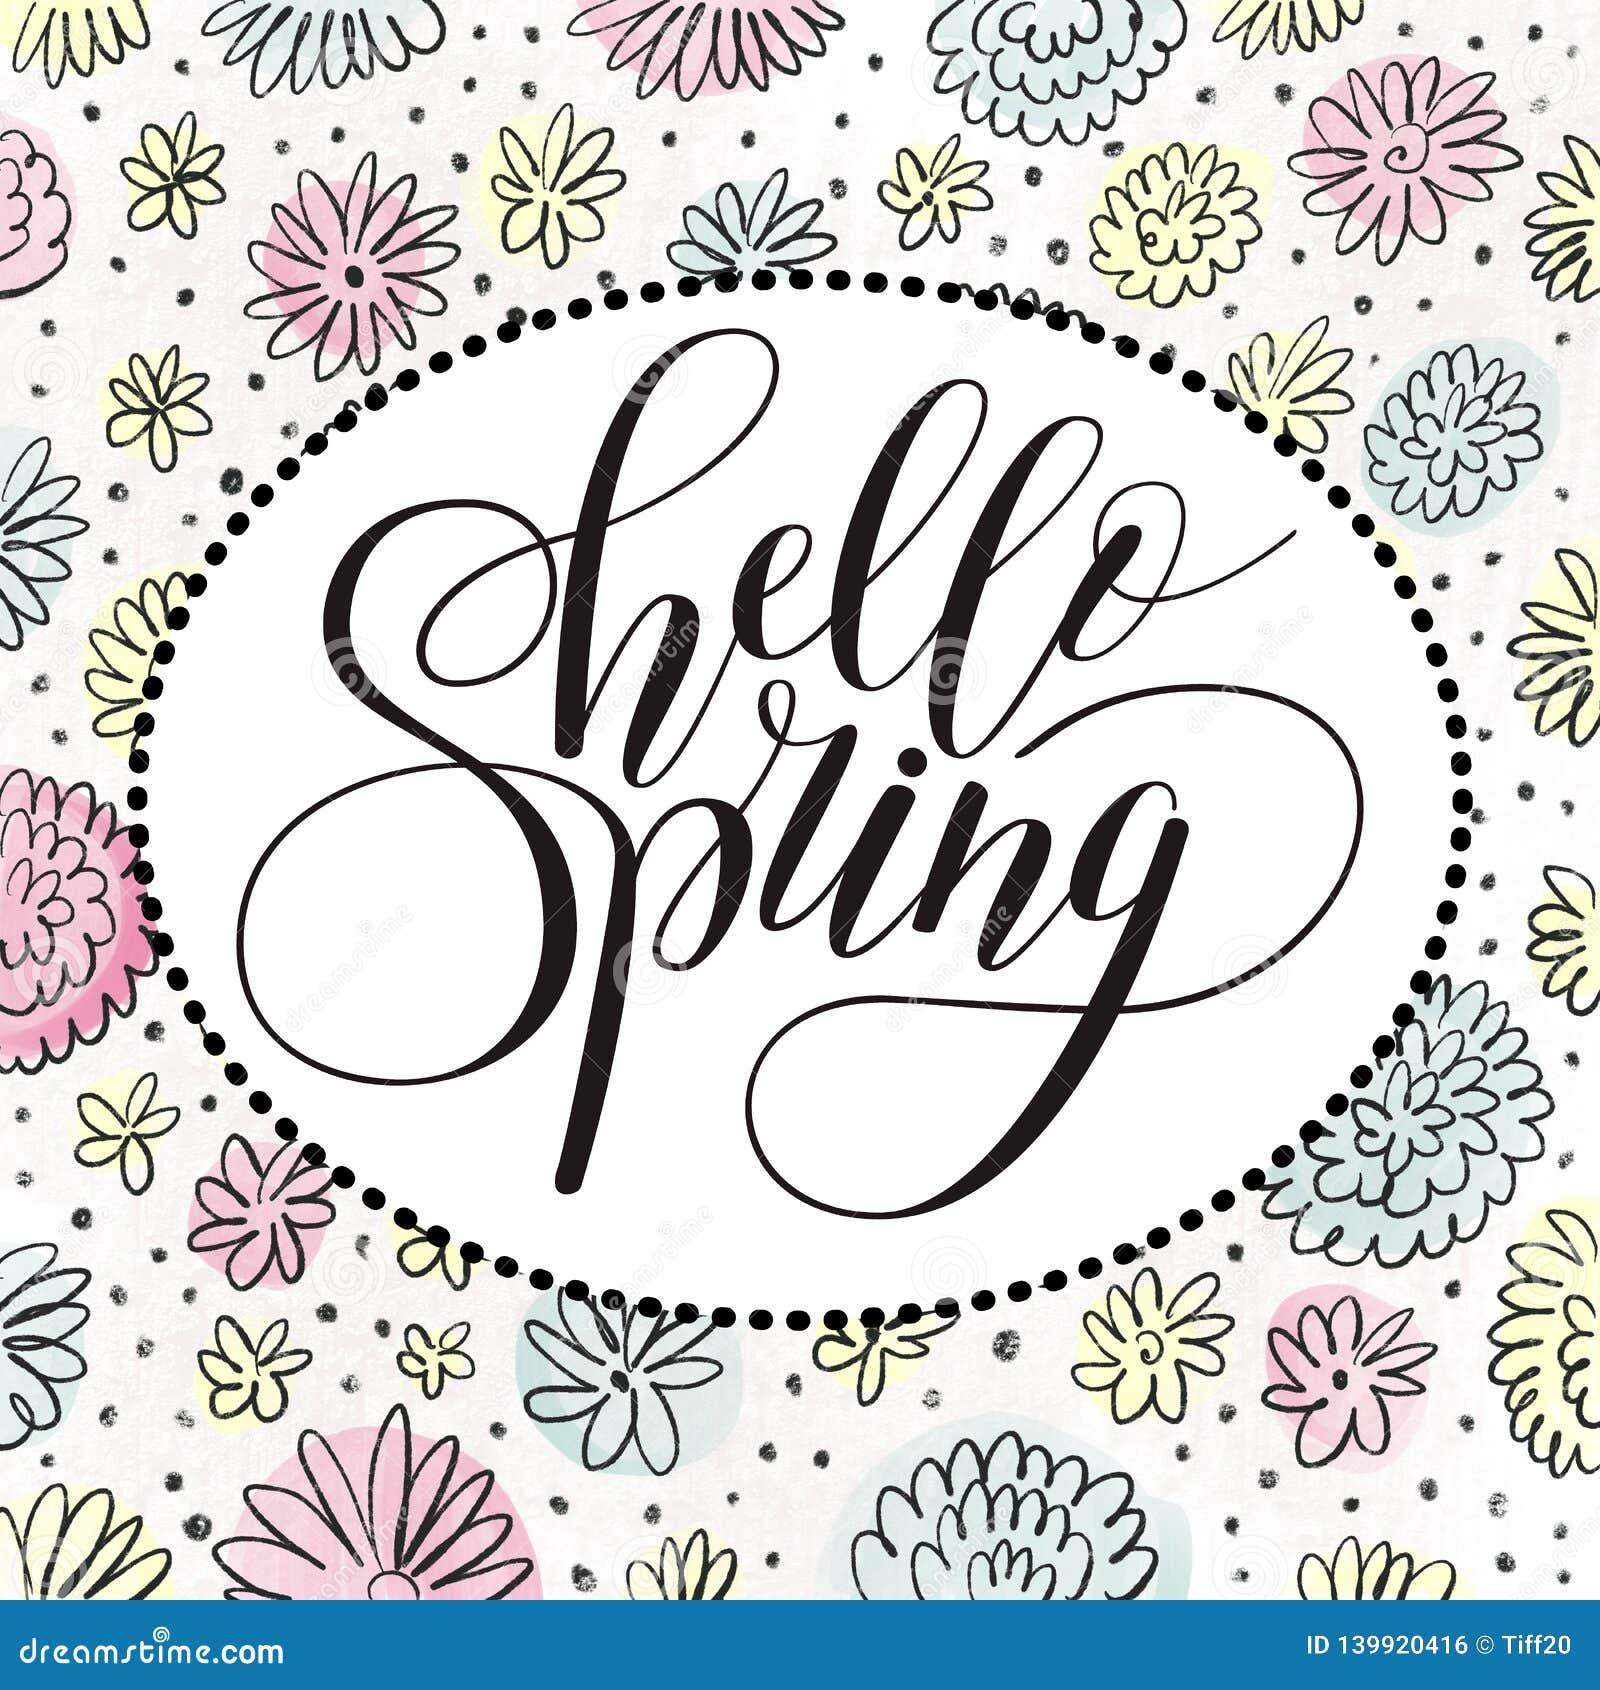 Fhrase `Hello spring!` Brush Pen lettering on a floral background